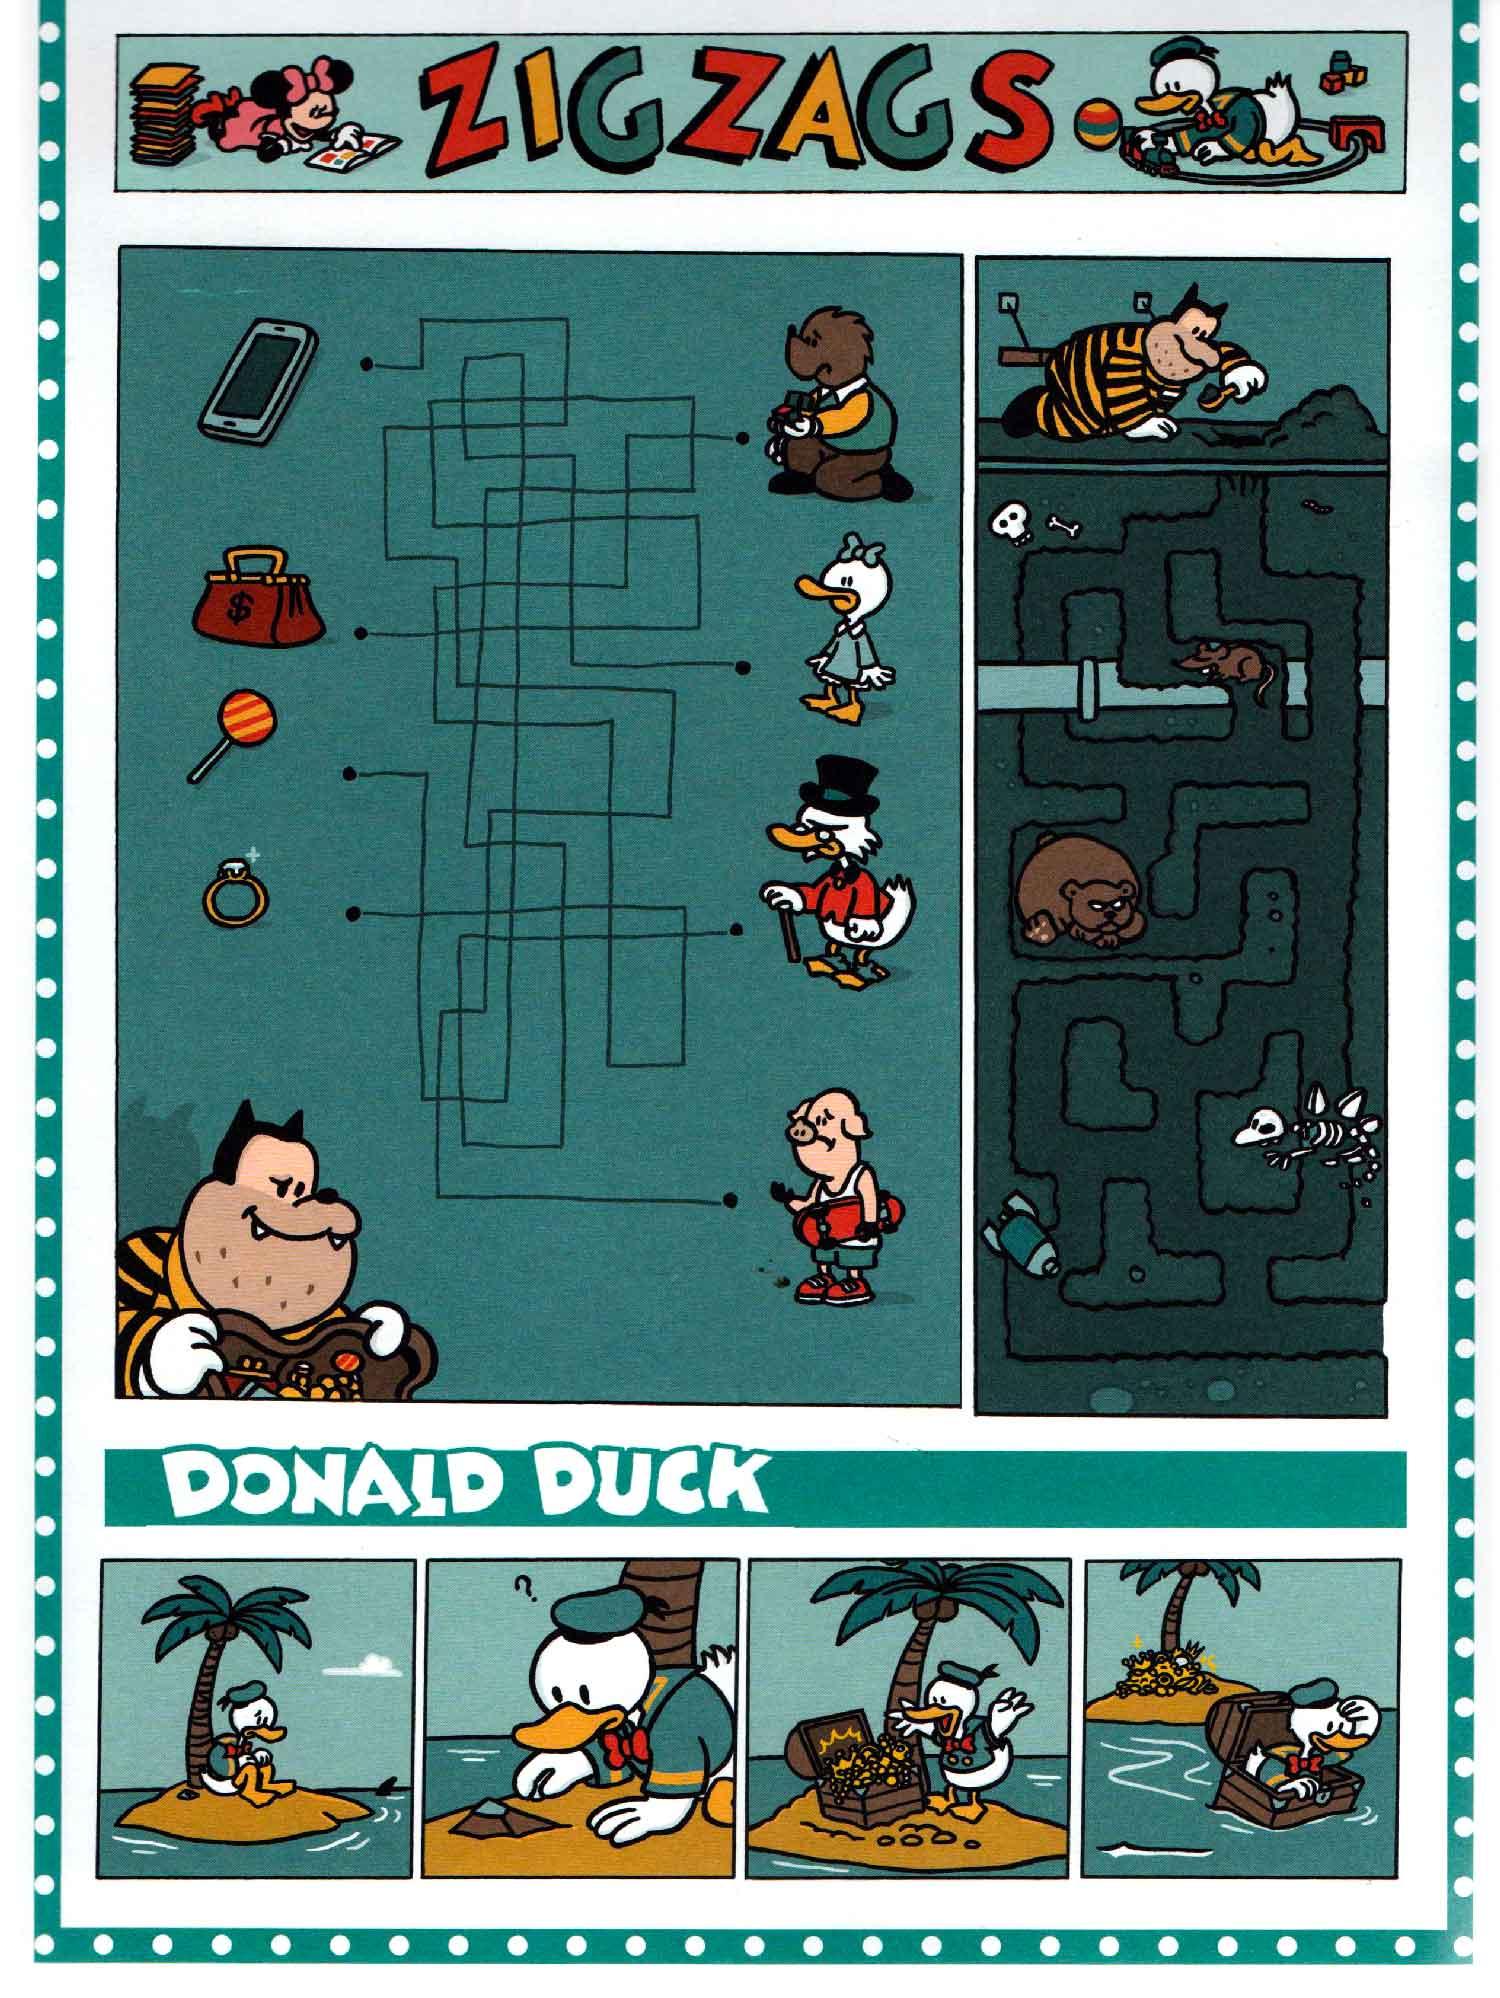 Donald-ile